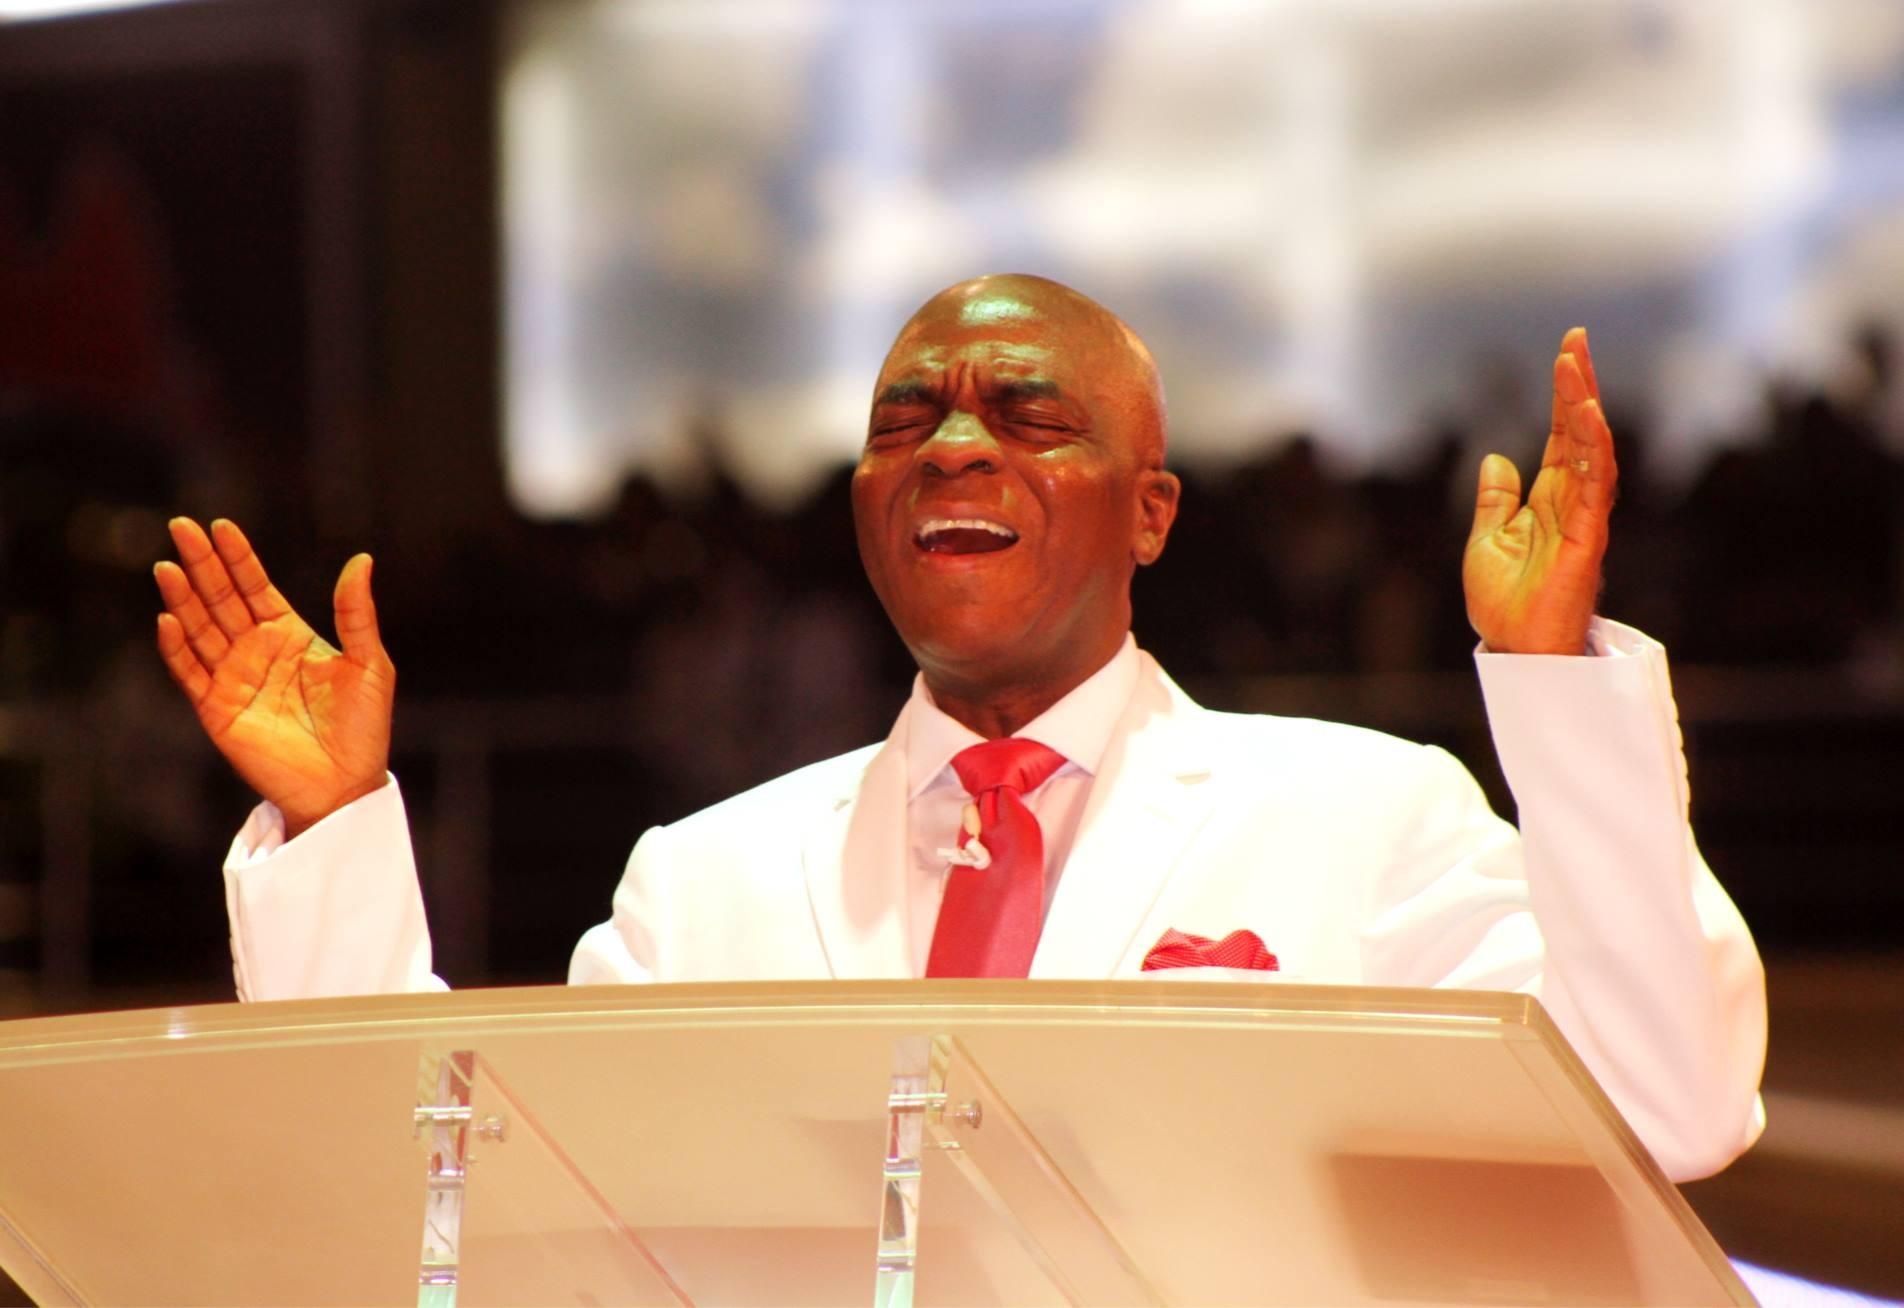 Bishop Oyedepo spits fire!